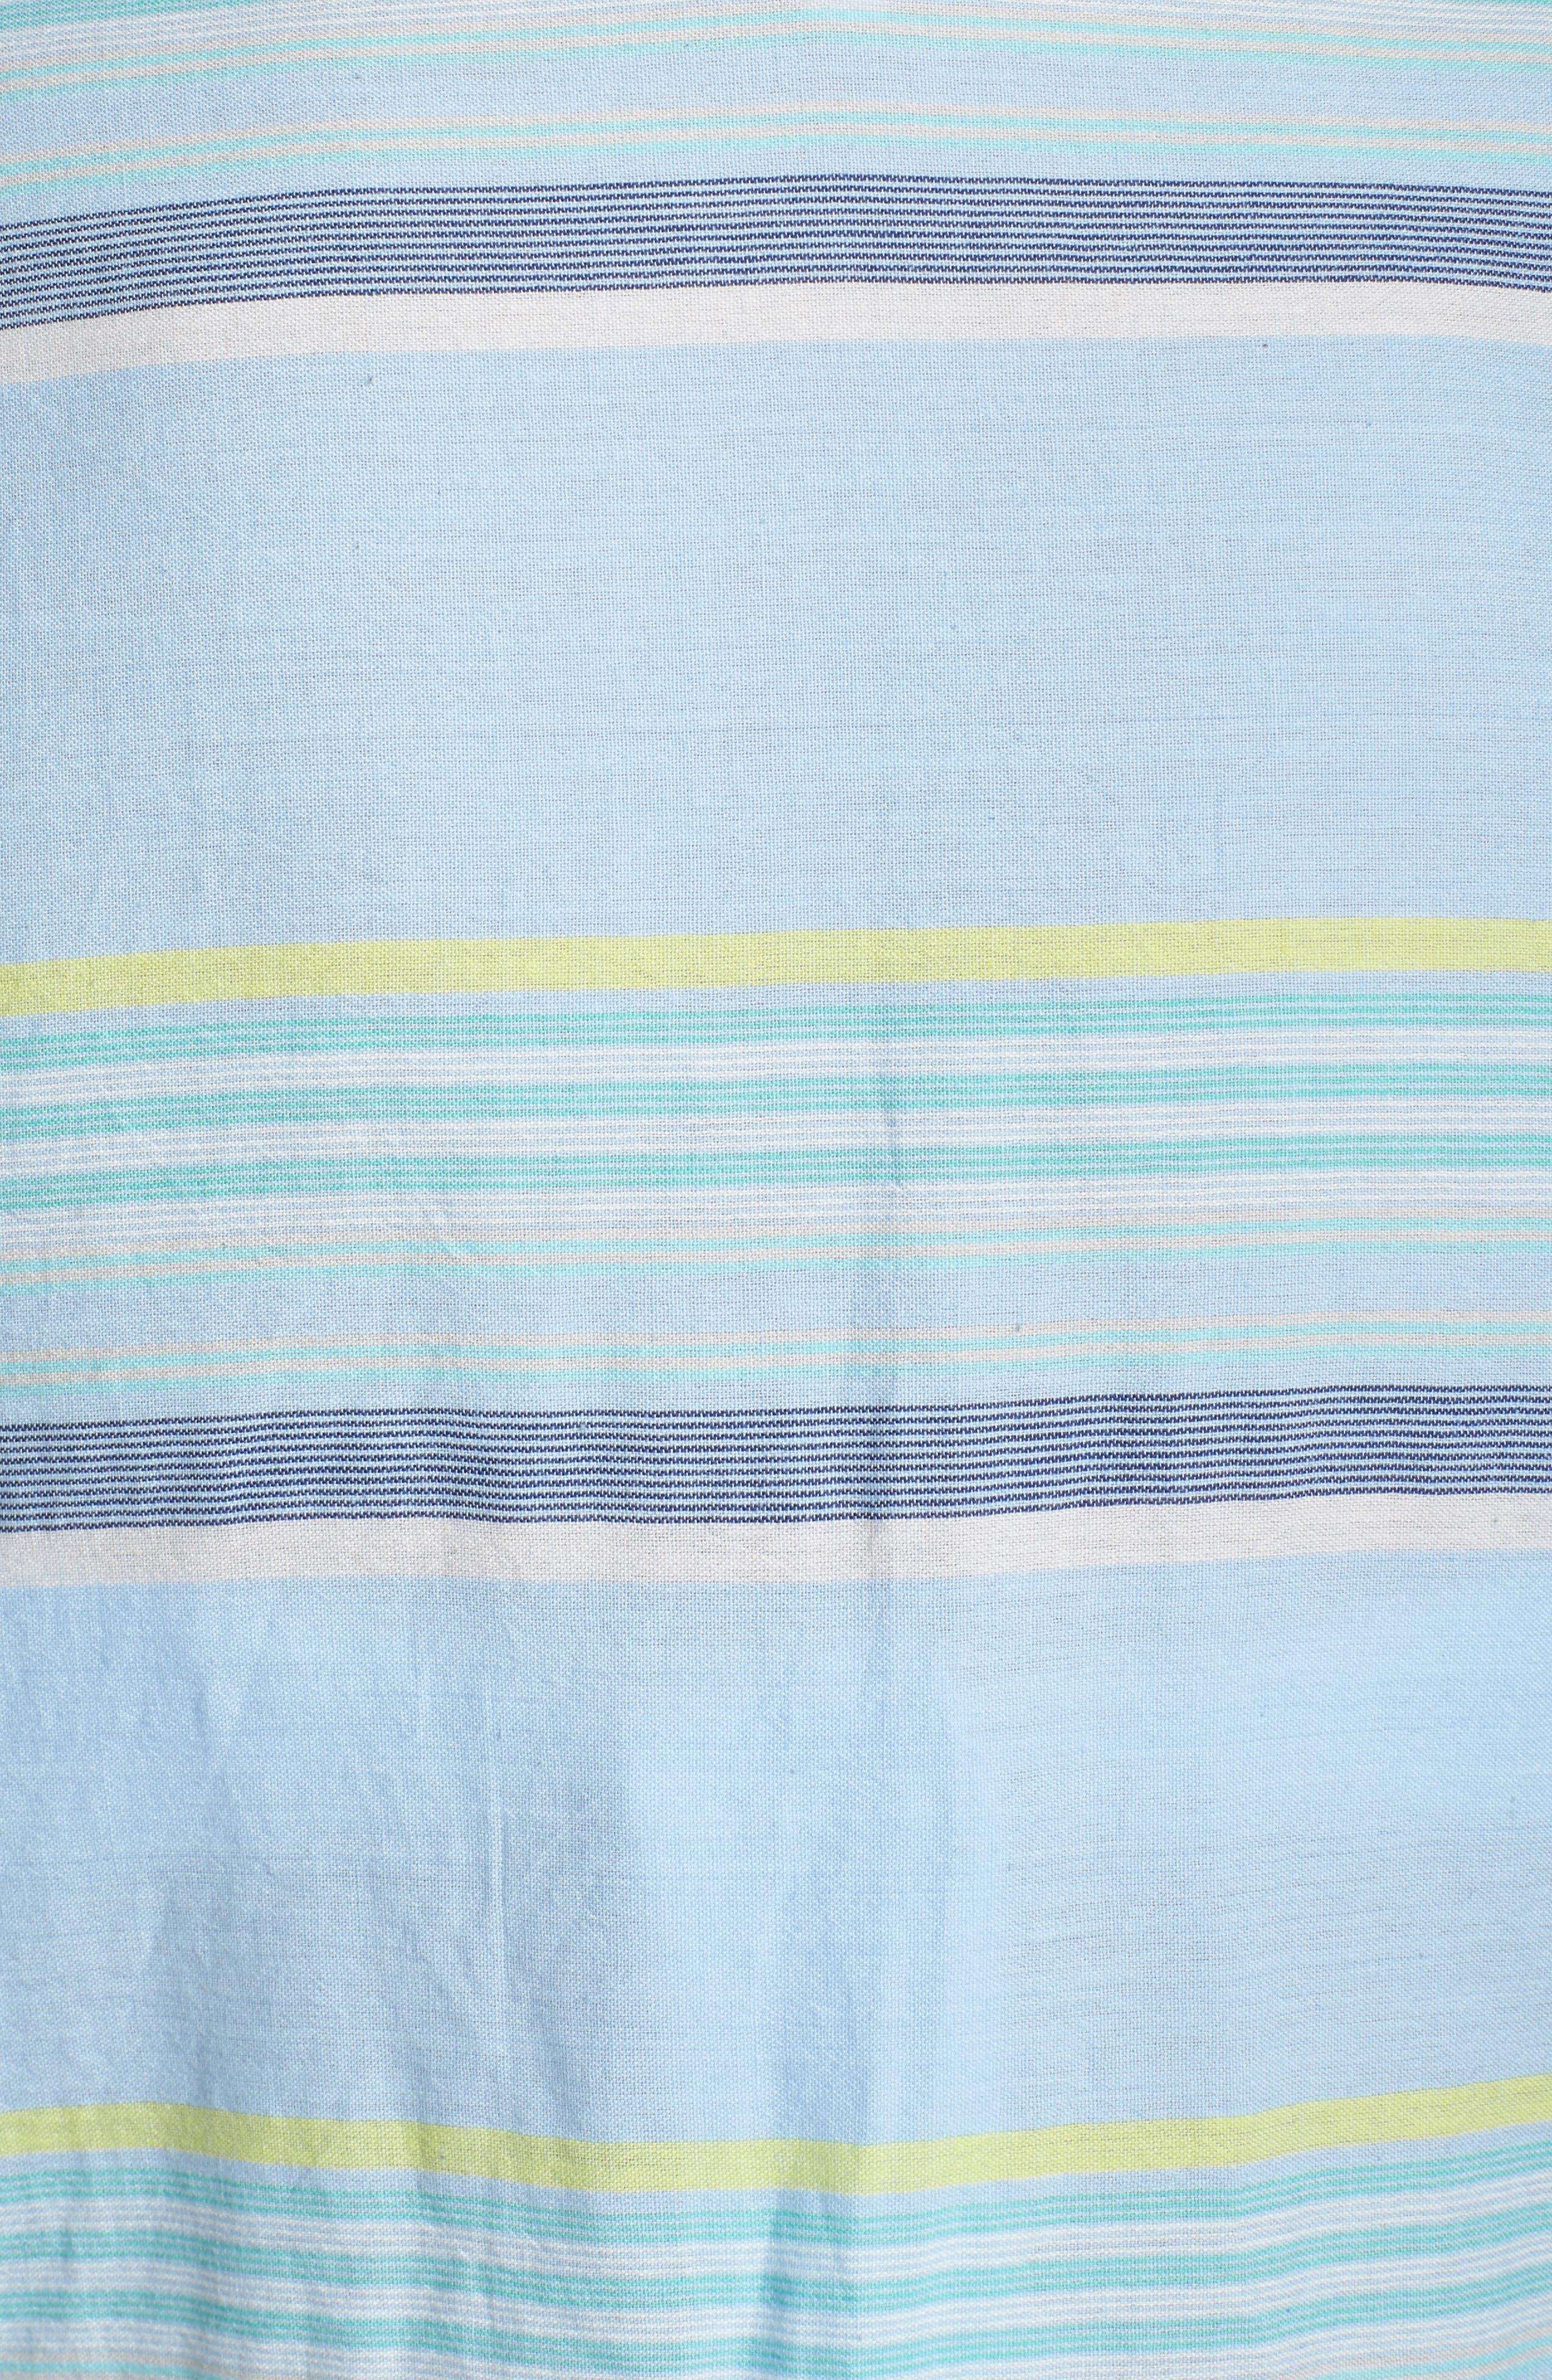 Sunset Stripe Cover-Up,                             Alternate thumbnail 5, color,                             Sky Blue